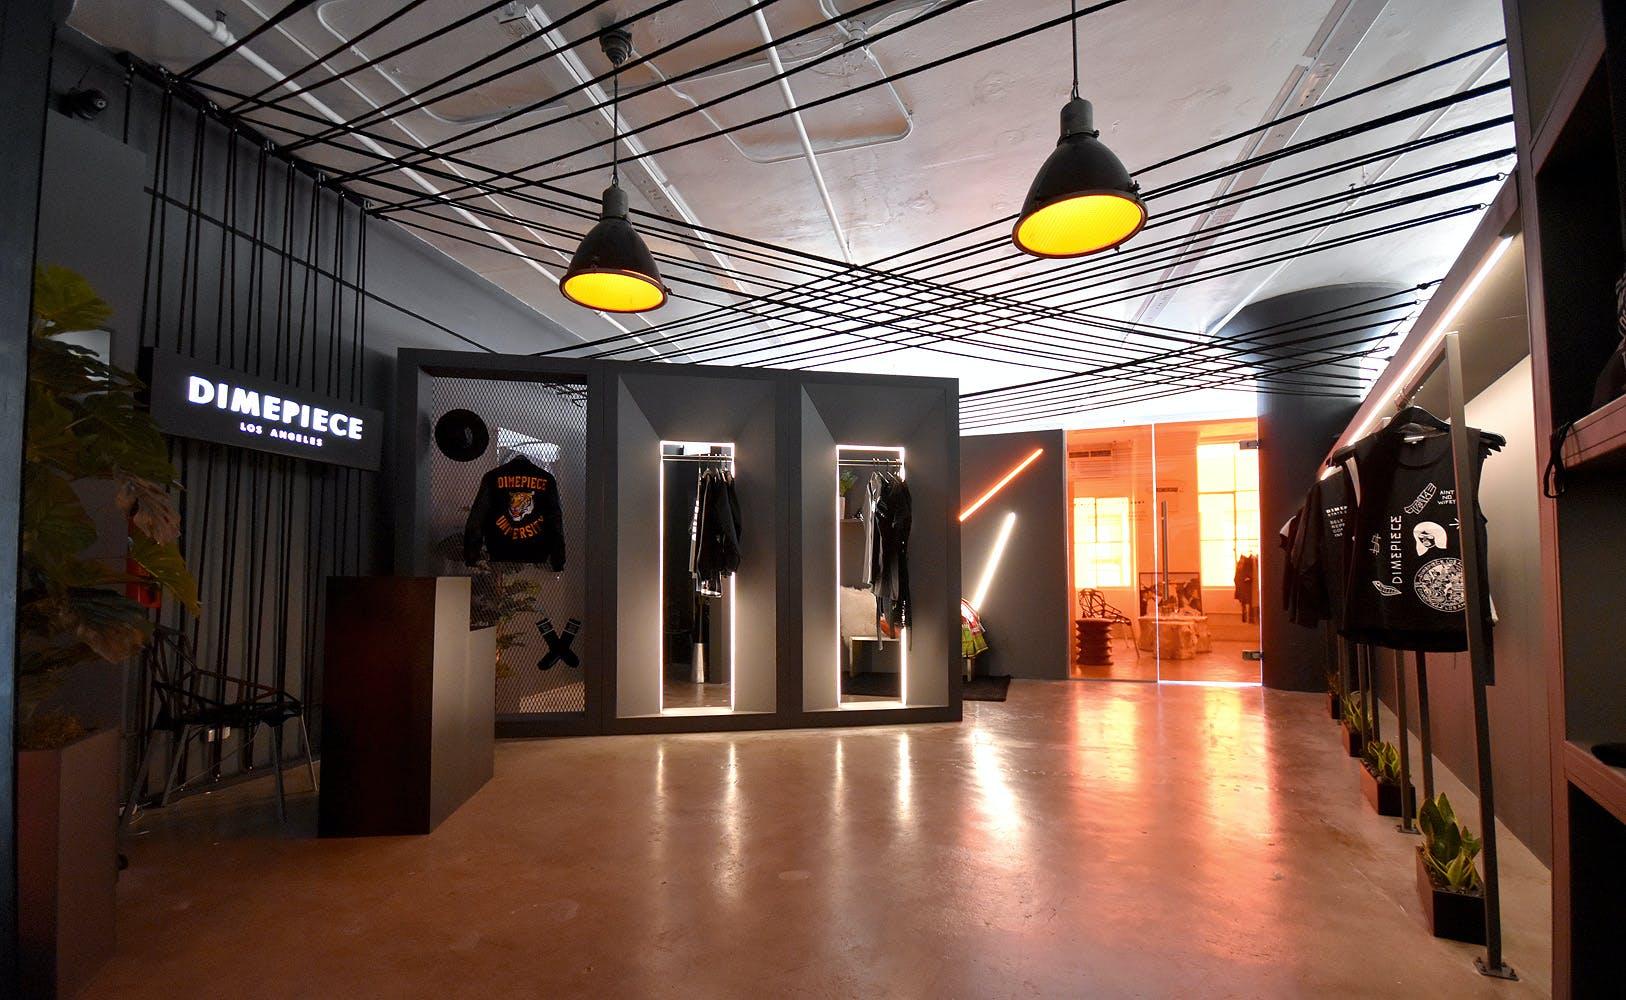 Dimepiece Retail A Industrial Design Build Archinect